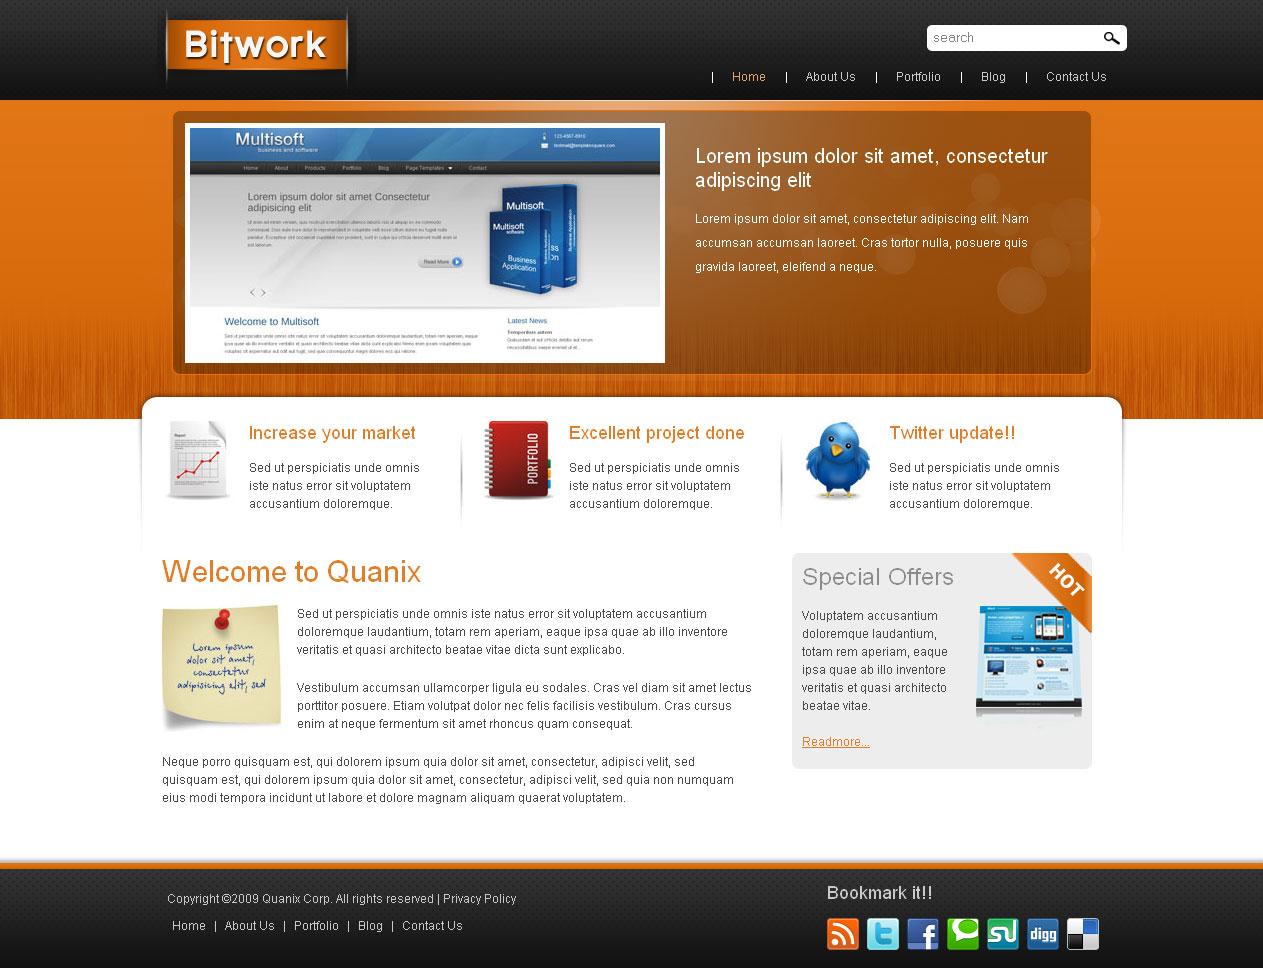 Bitwork - Portfolio and Business Website Template